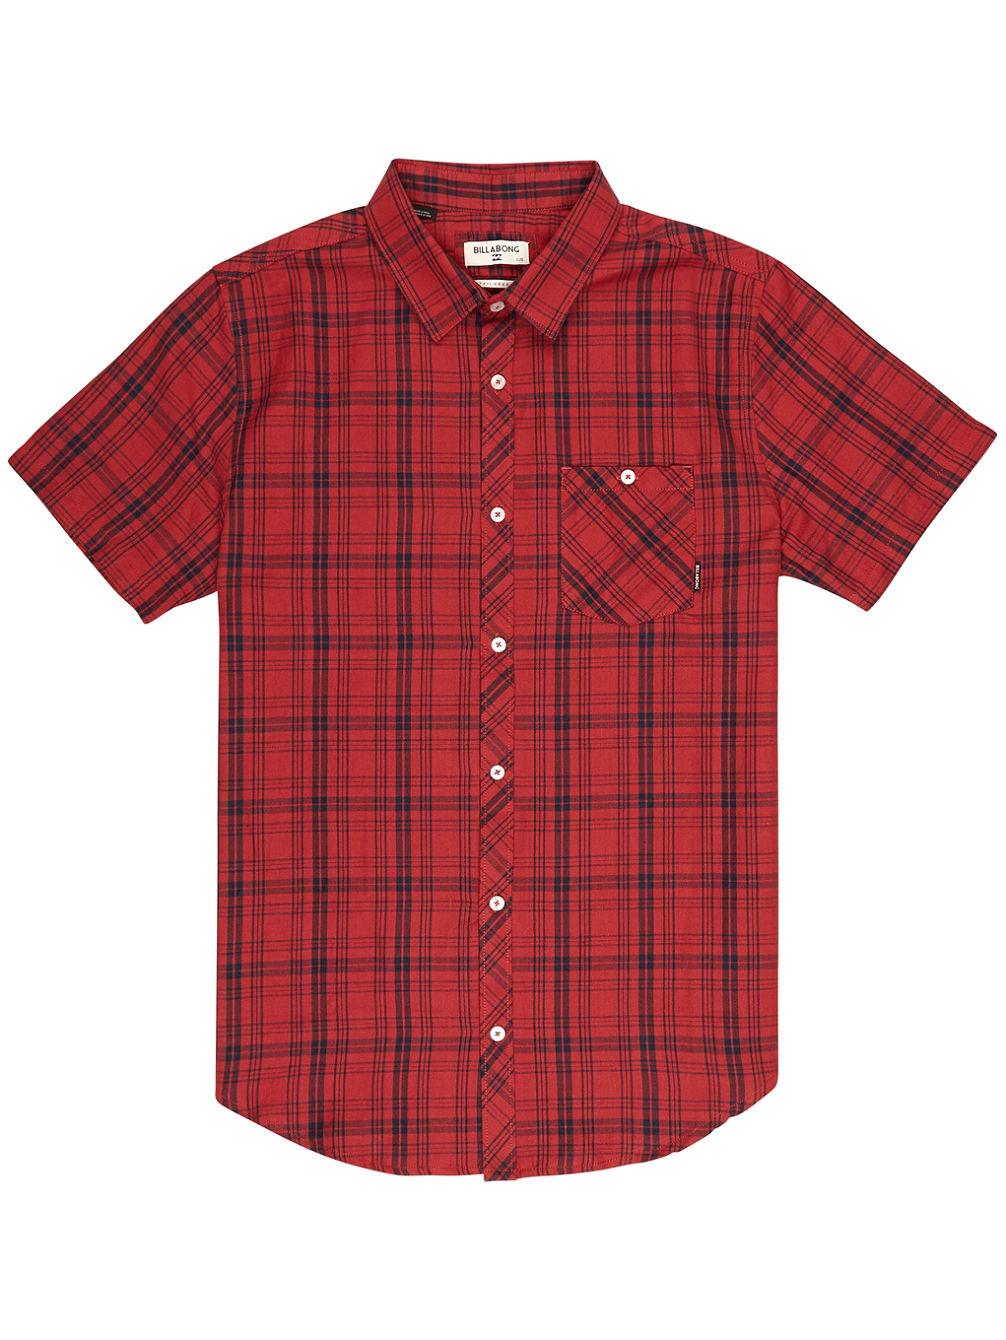 b5c80d6e3c Buy Billabong All Day Check Shirt online at Blue Tomato